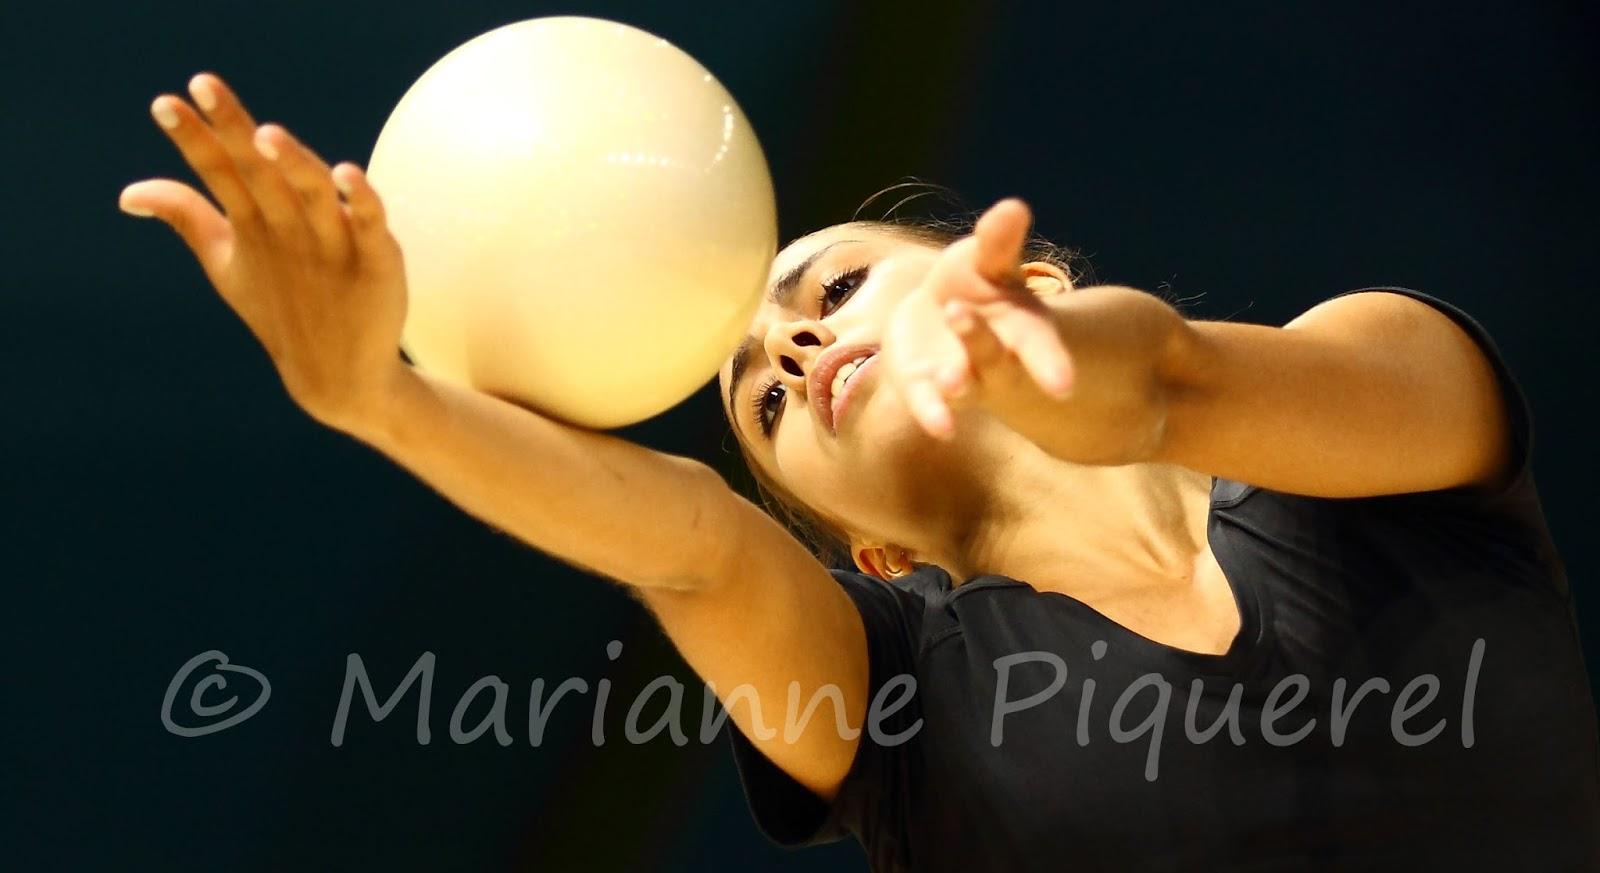 margarita-mamun-golaya